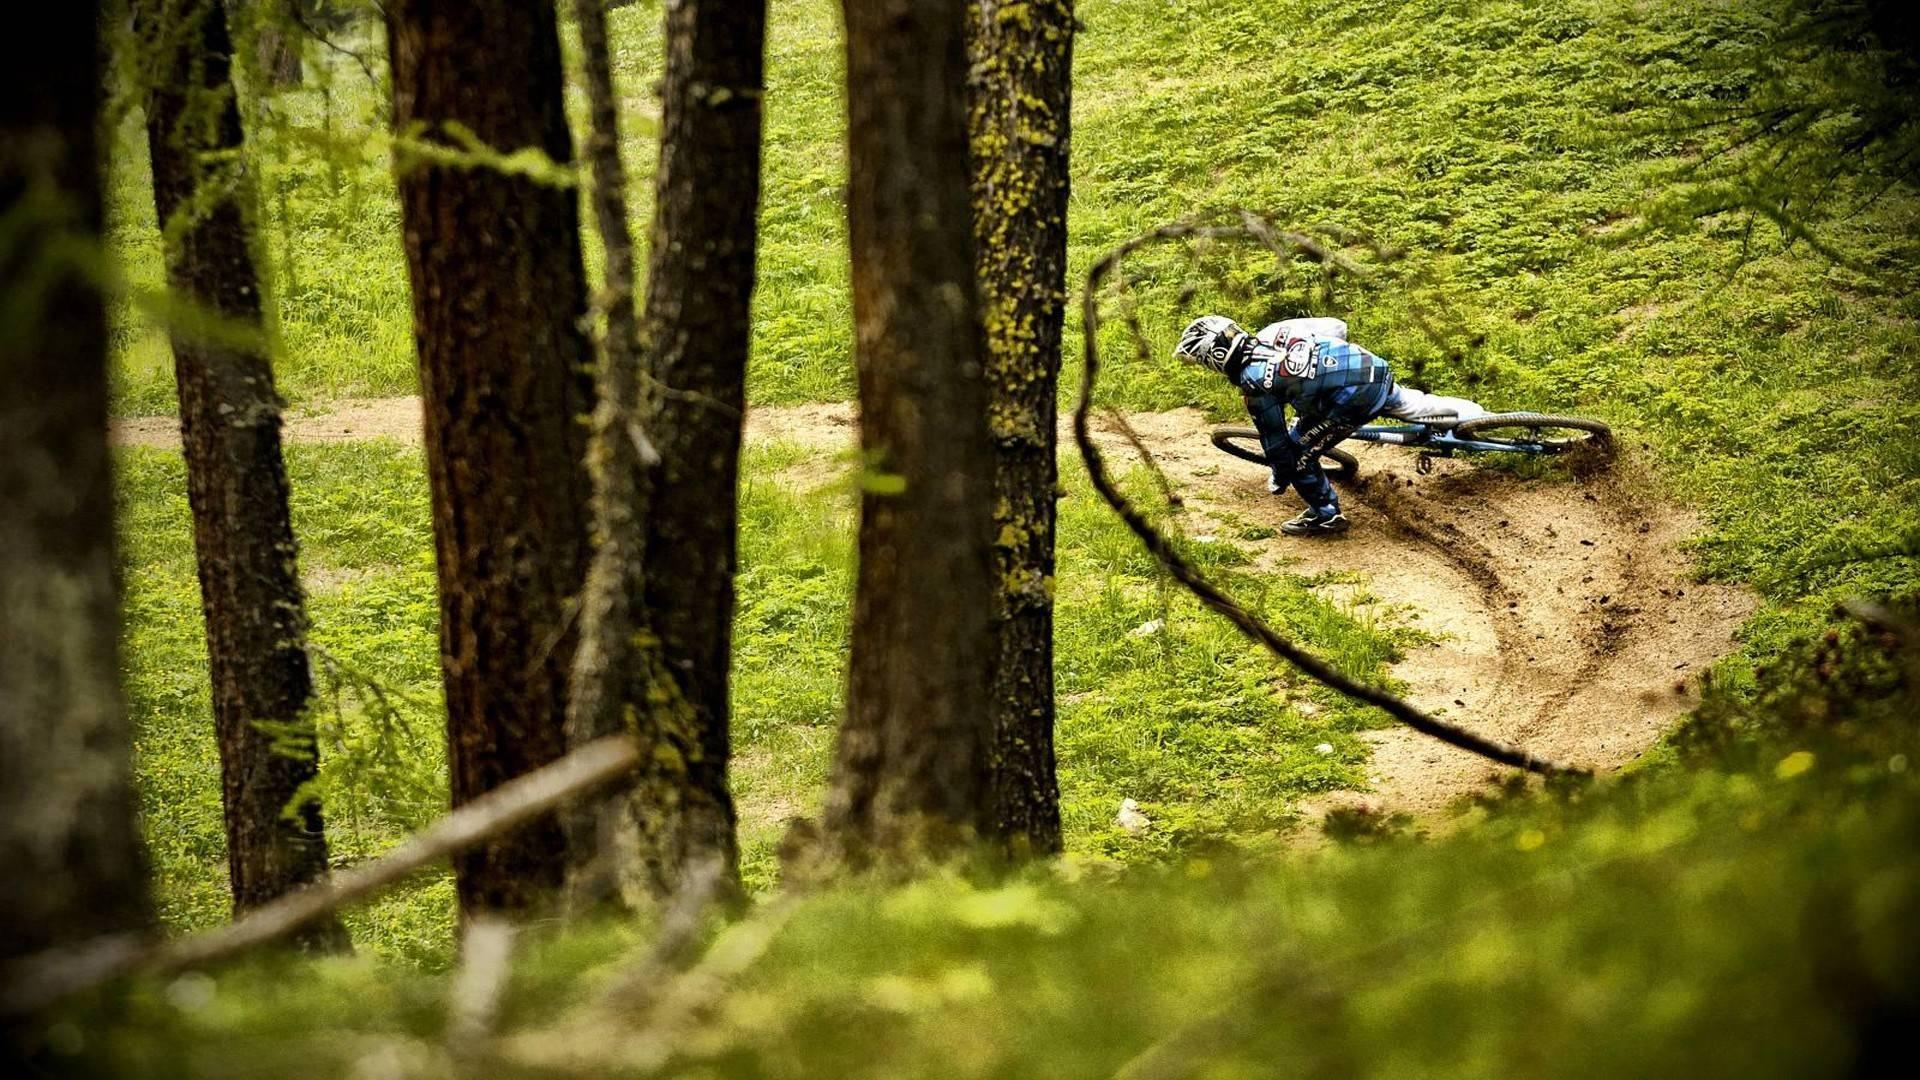 mountain biking high definition wallpaper 09289 - baltana